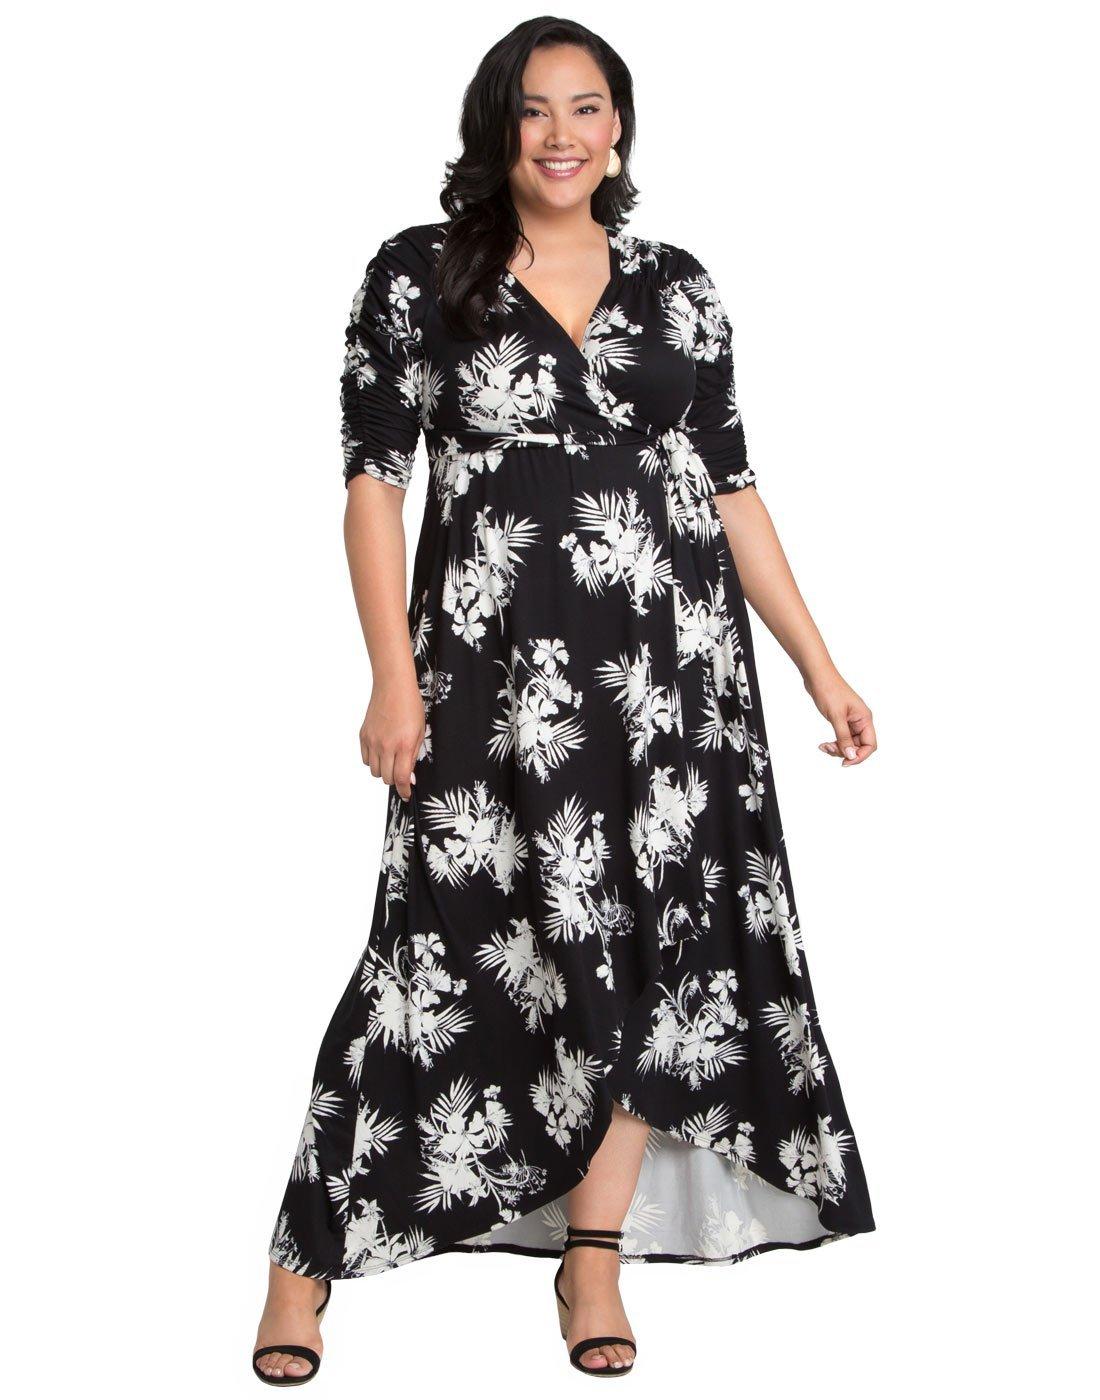 08b2ed5e924d1 Home Brands Kiyonna Dresses Kiyonna Women s Plus Size Meadow Dream Maxi  Dress 2X Tropical Noir.   